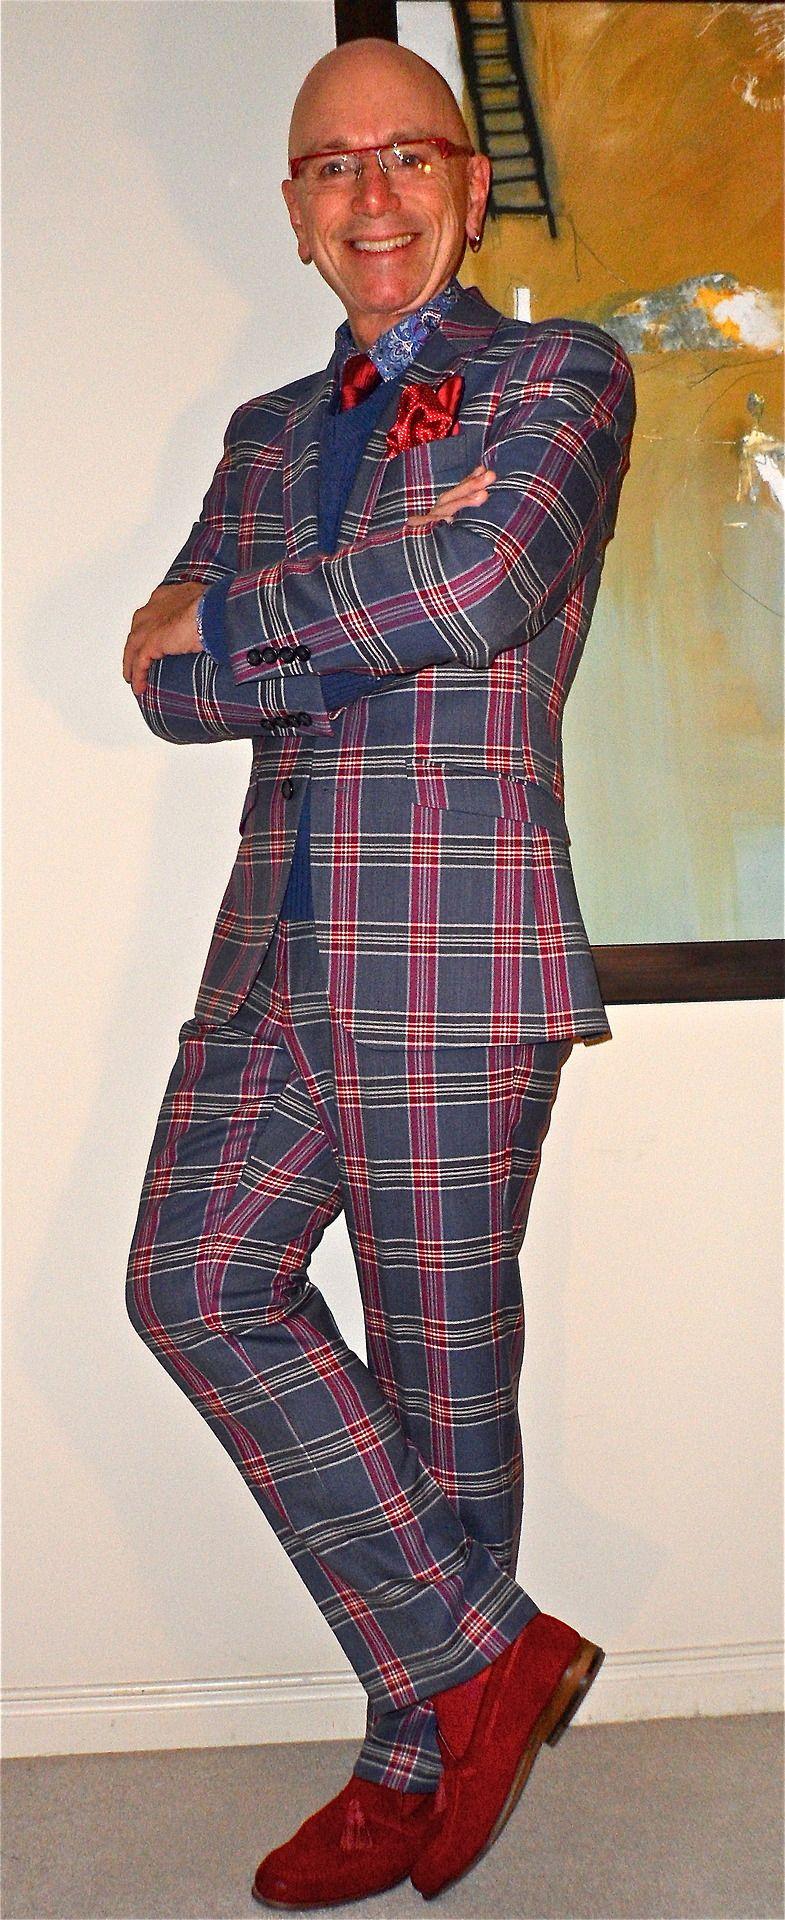 Moods of Norway suit + shirt, Hugo Boss tie, Joe Fresh sweater, BKR tassel loafers…  #menstyle #menswear #menscouture #mensfashion #instafashion #fashion #hautecouture #sartorial #sprezzatura #style #dapper #dapperstyle #pocketsquare #gotstyle #shopgotstyle